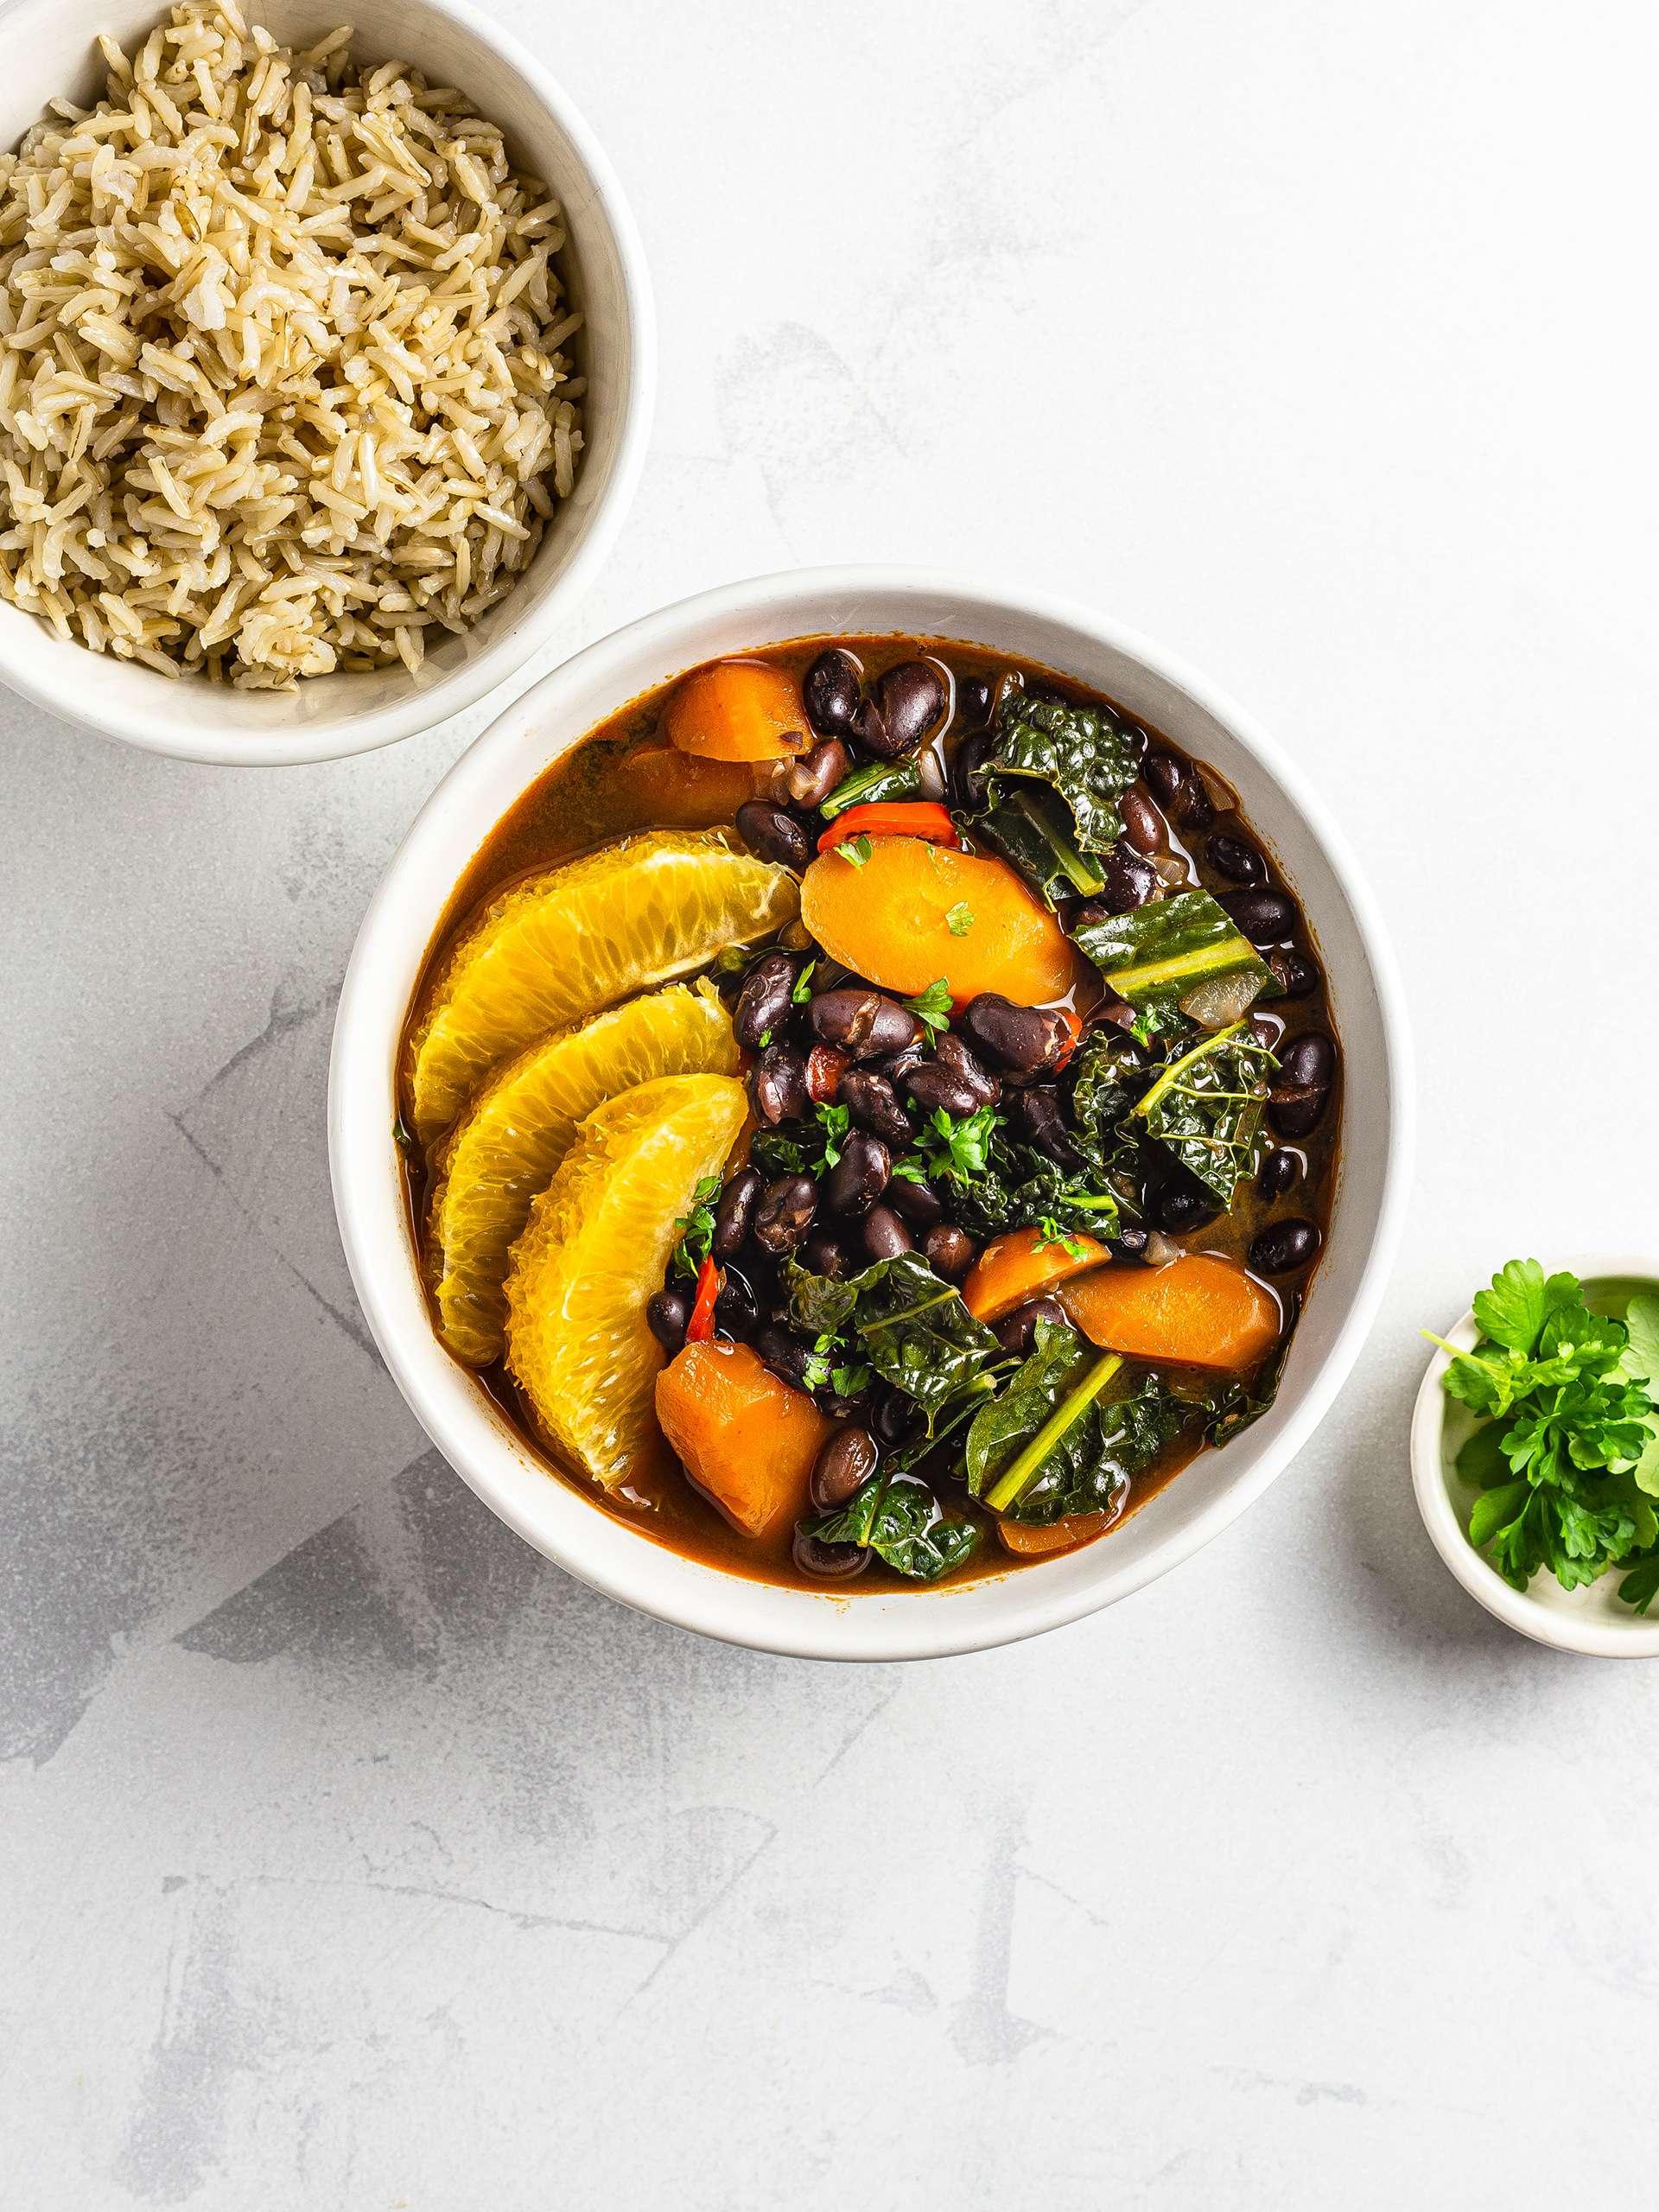 Vegan brazilian feijoada with black beans kale and carrots